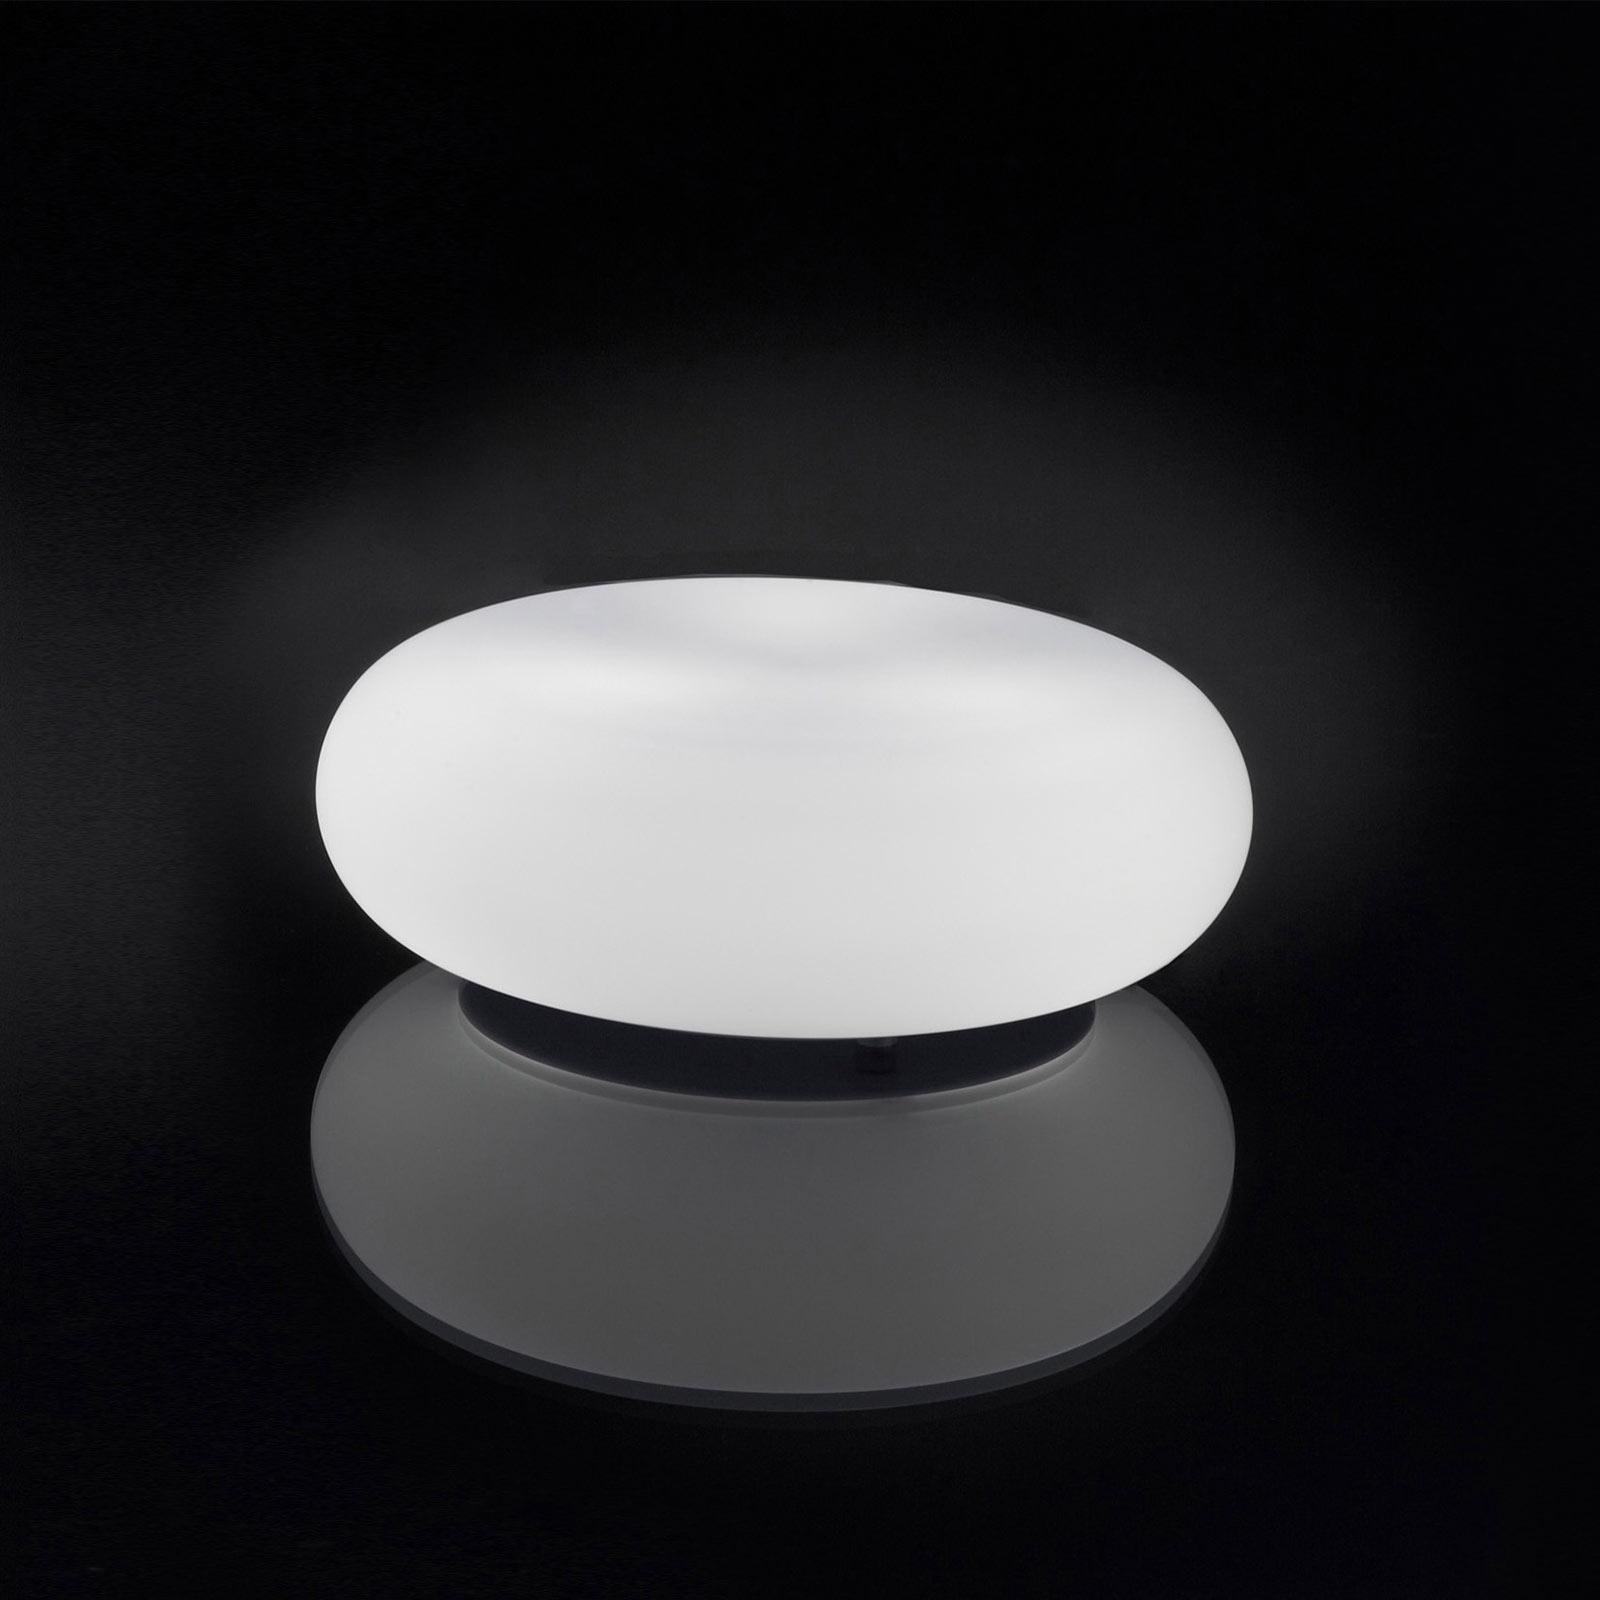 Artemide Itka lampa stołowa szklany klosz Ø 20 cm